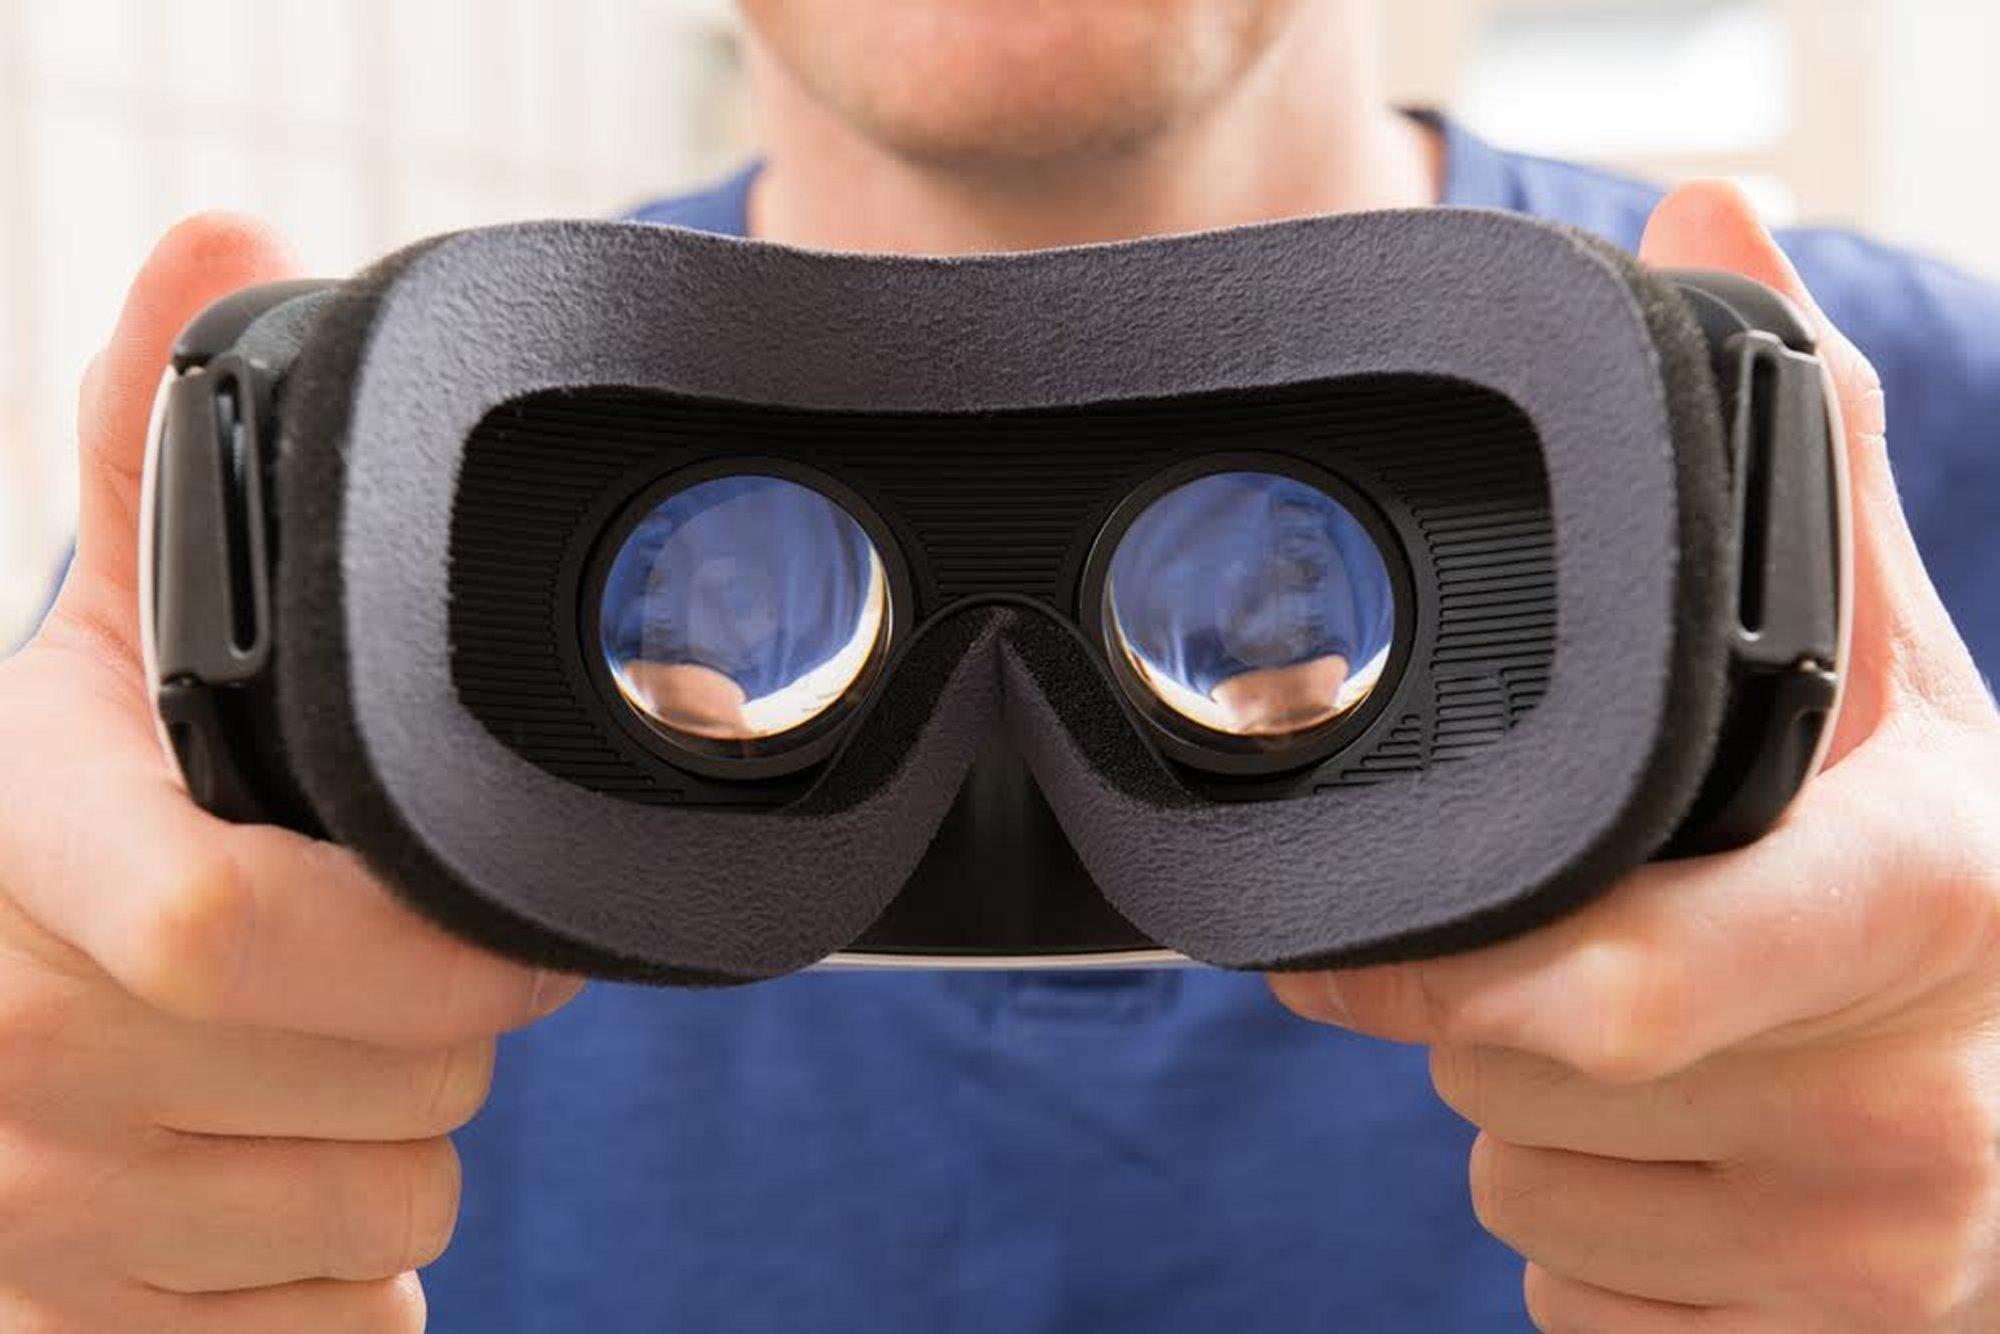 Man holding VR headset